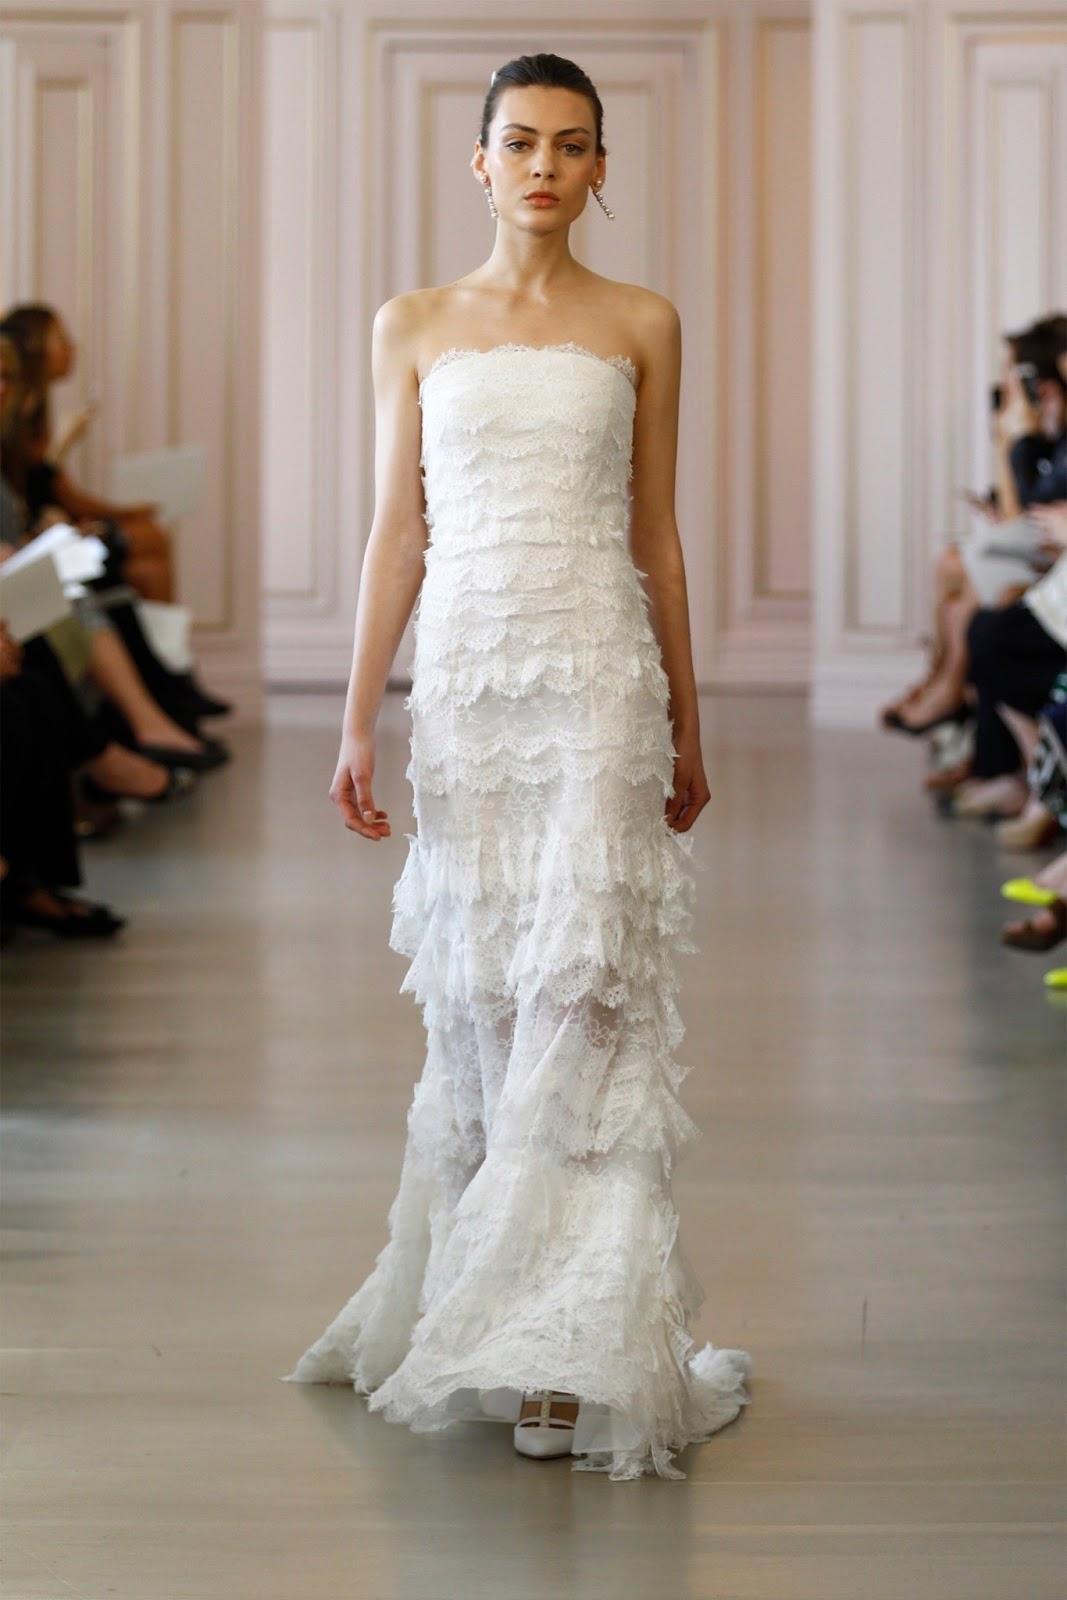 Bridal wear new bridal dresses for spring brides 2016 by for De la renta wedding dresses